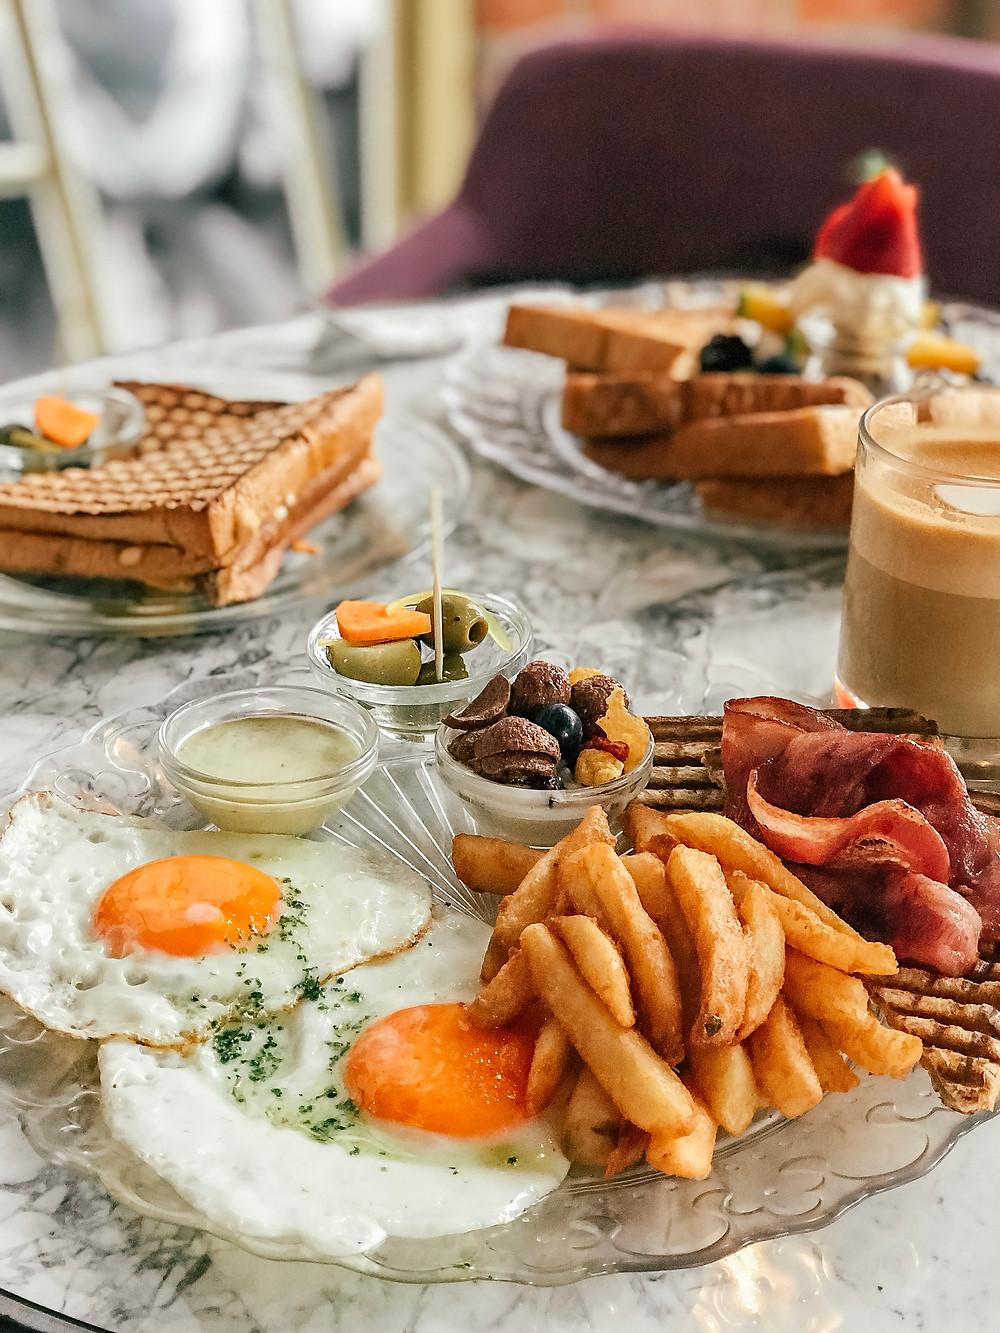 Best Western Breakfasts Taipei l A Style Alike l Taipei Cafe